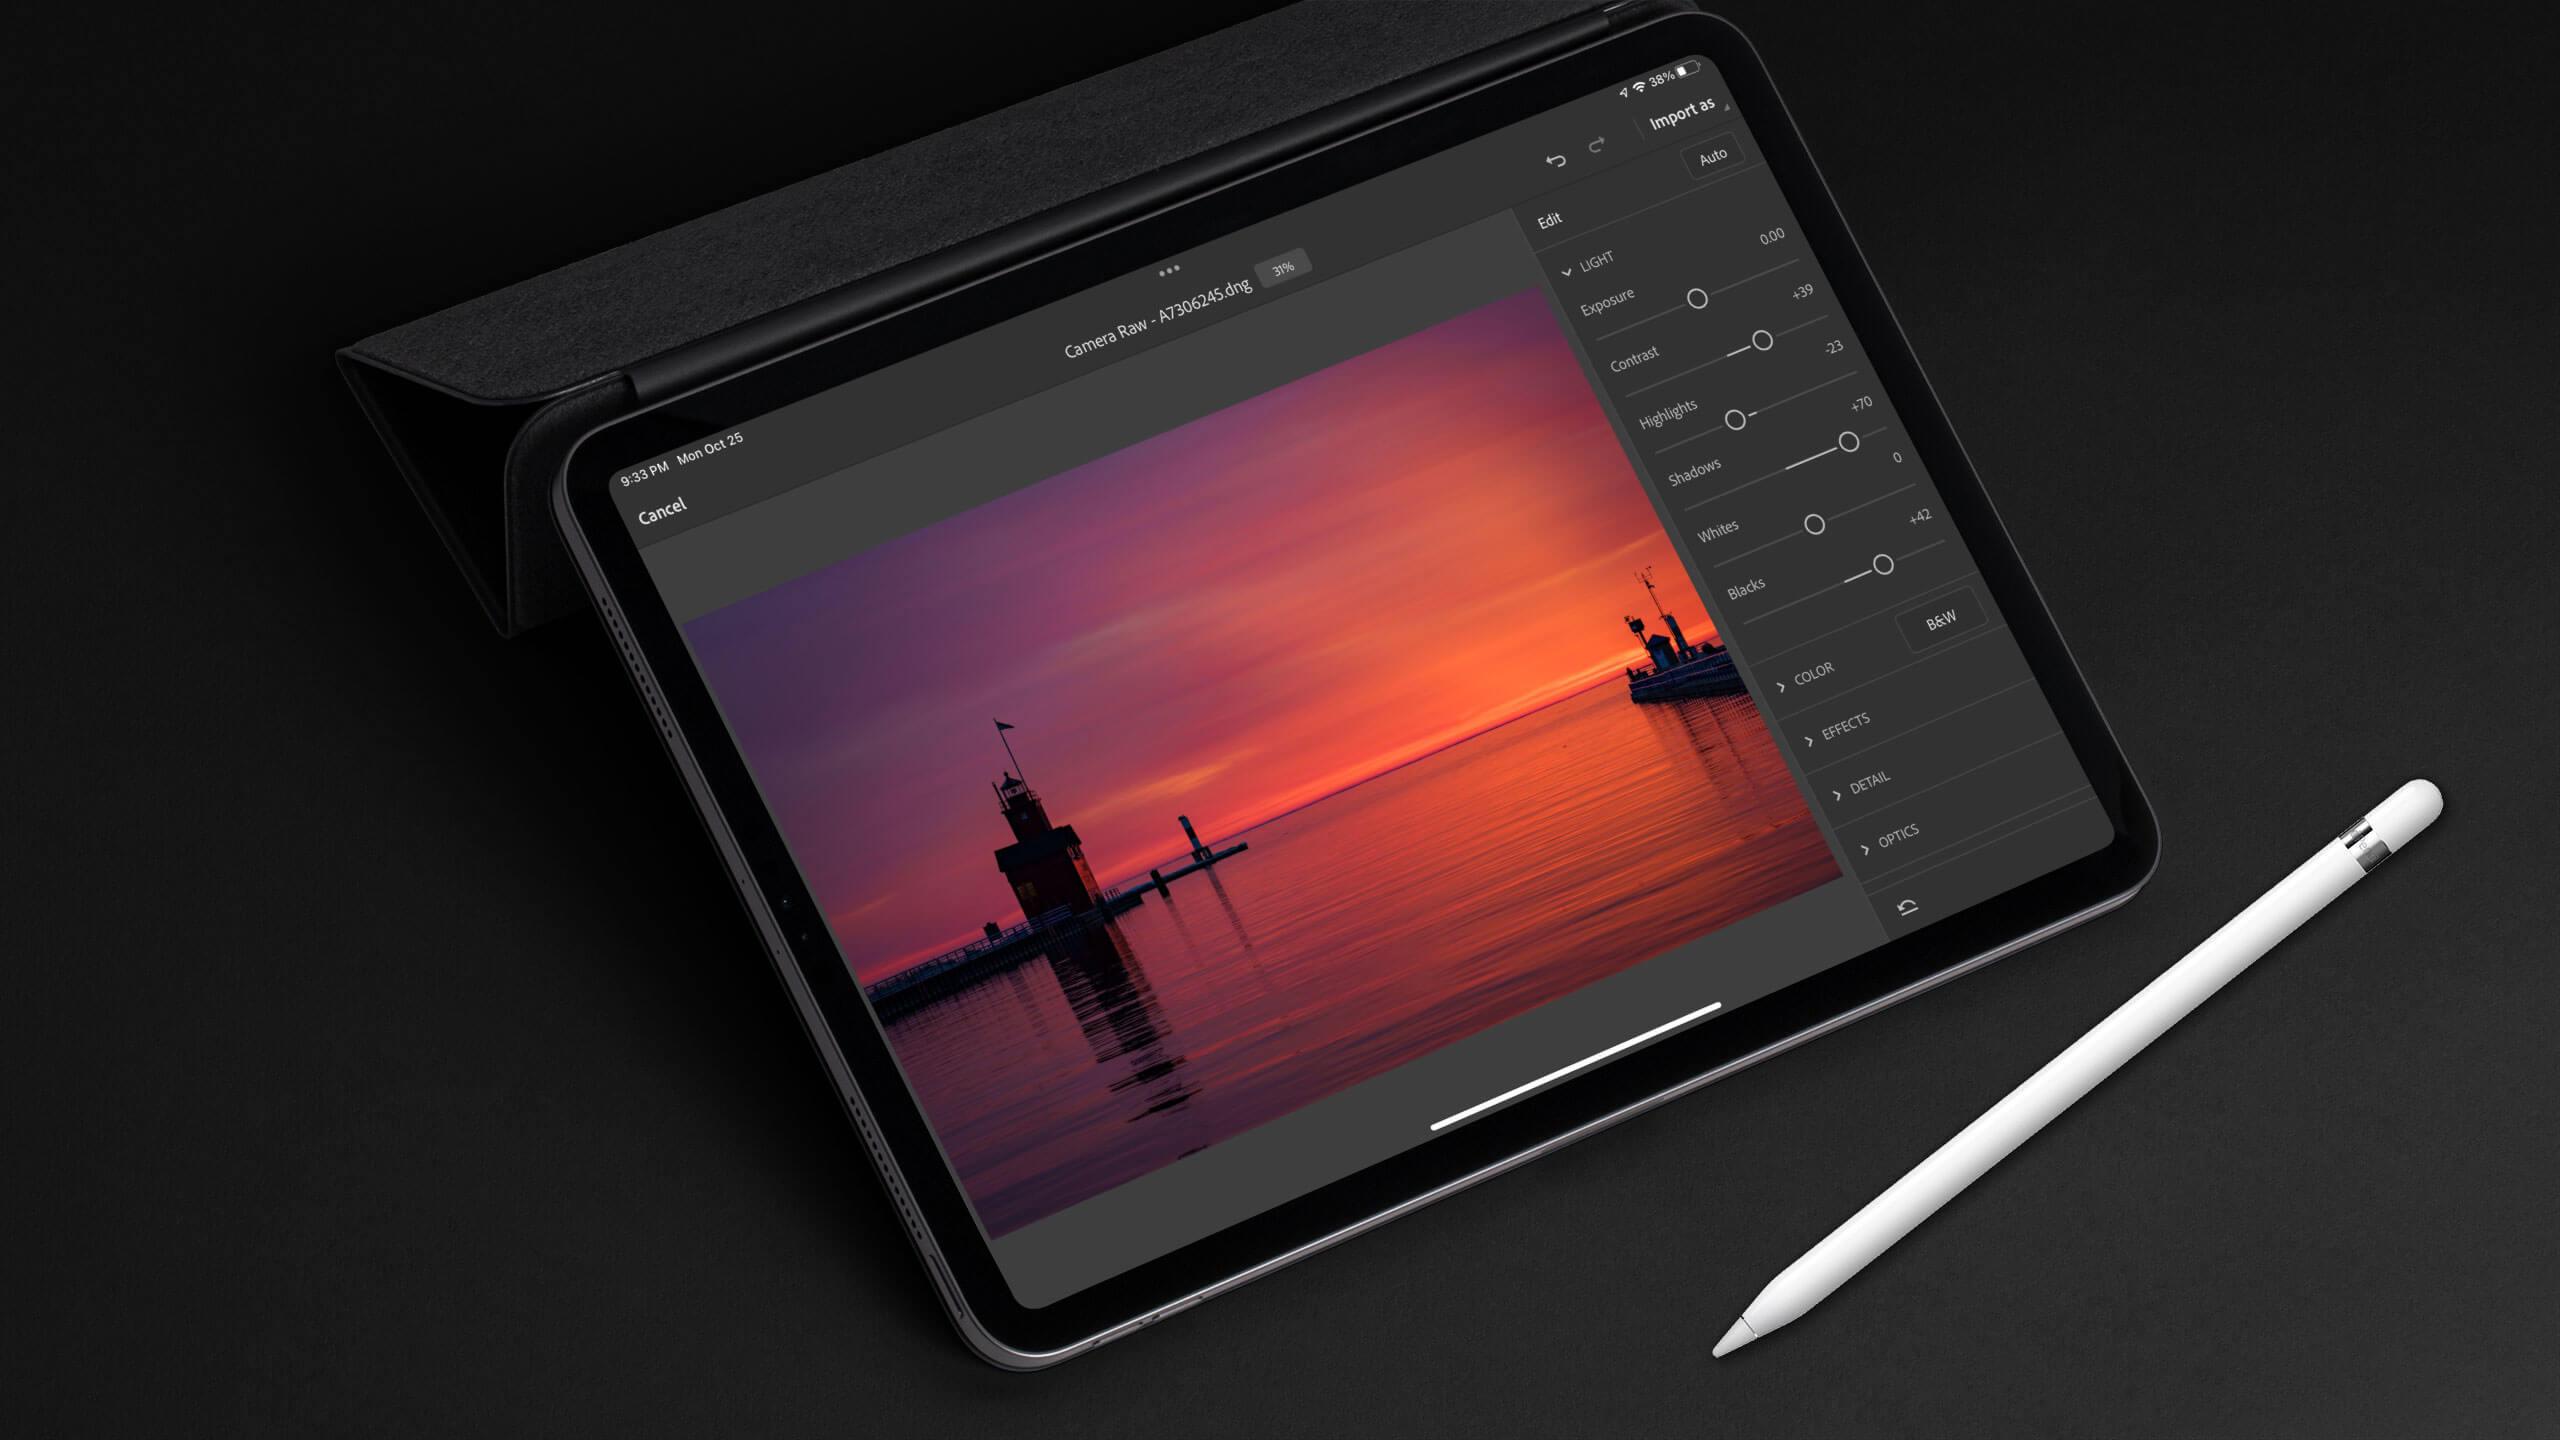 ipad-cameraraw-featured2